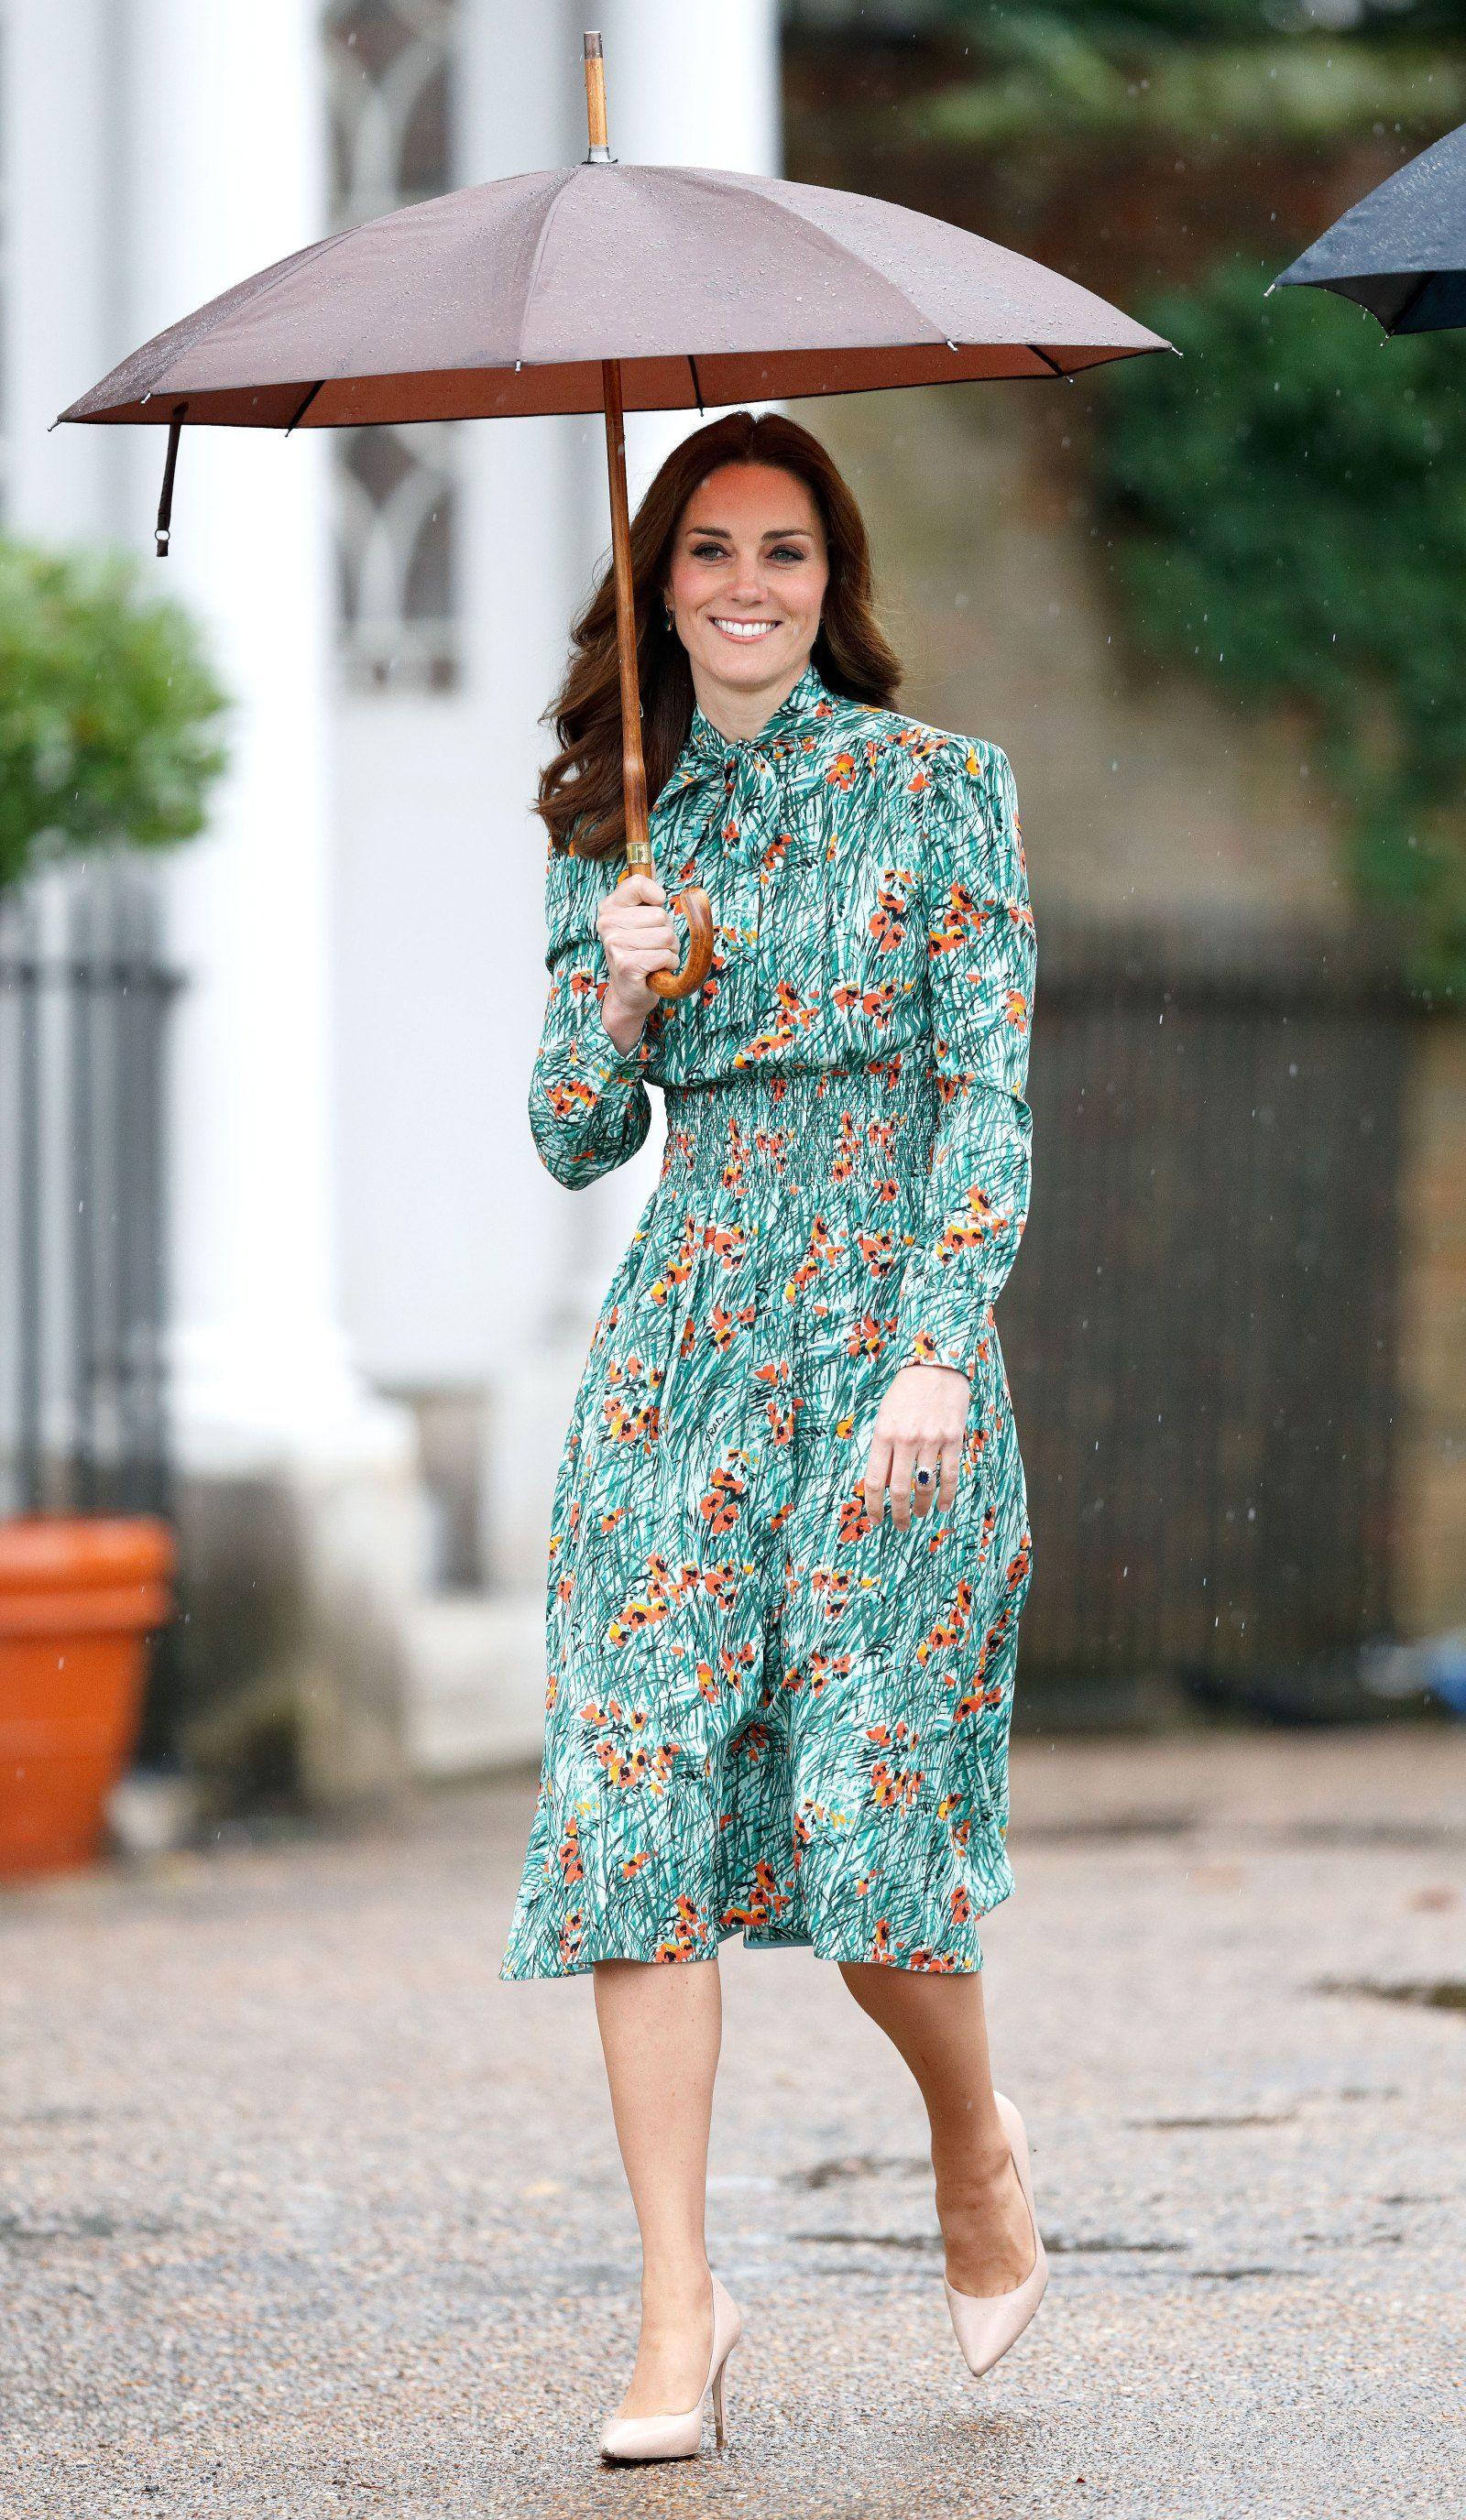 Kate Middleton Maternity Style, Third Pregnancy: Pics | Duchess kate ...